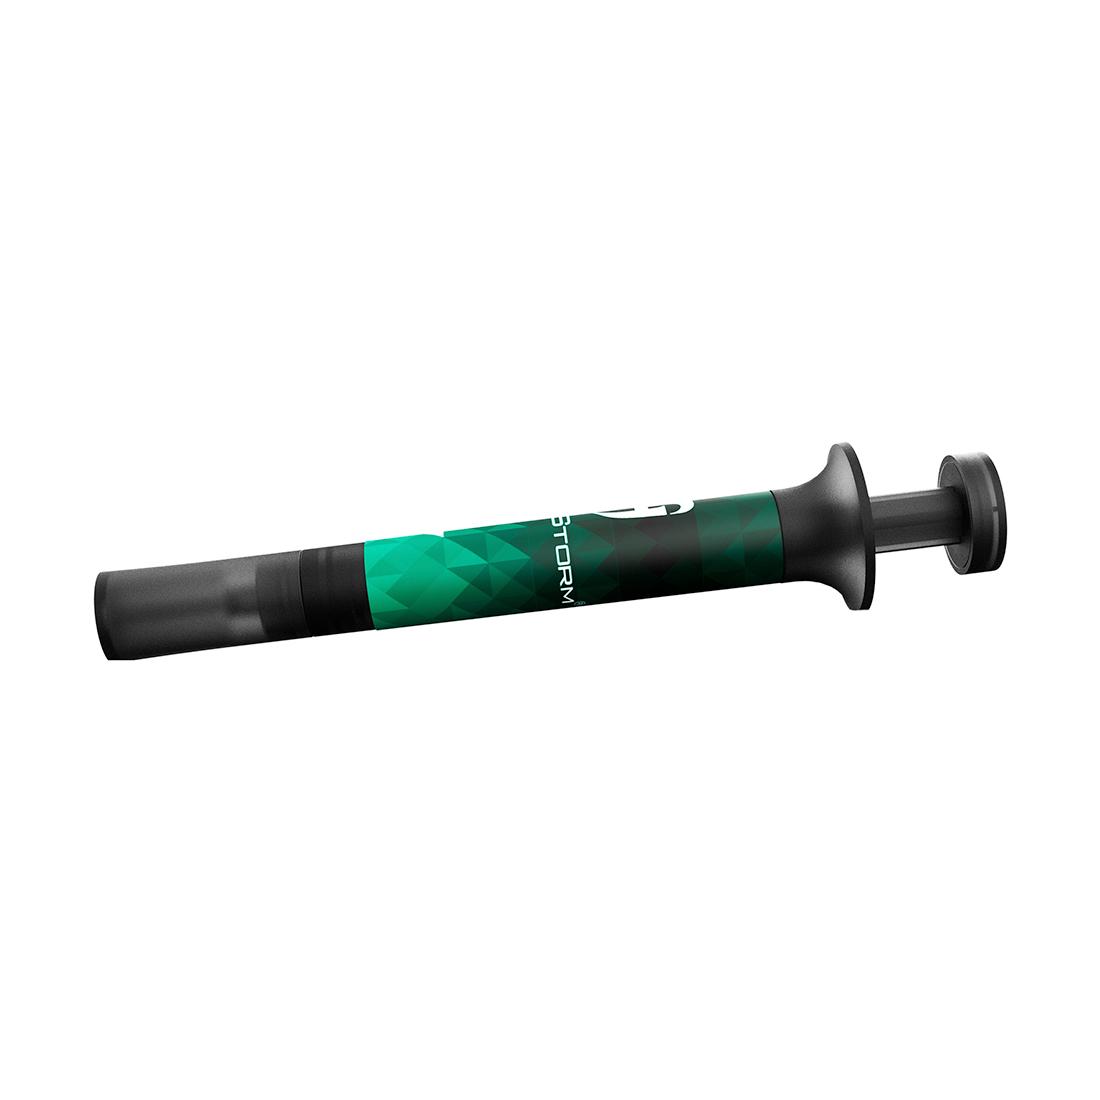 Термопаста Deepcool G15, в шприце, 1,5 грамм